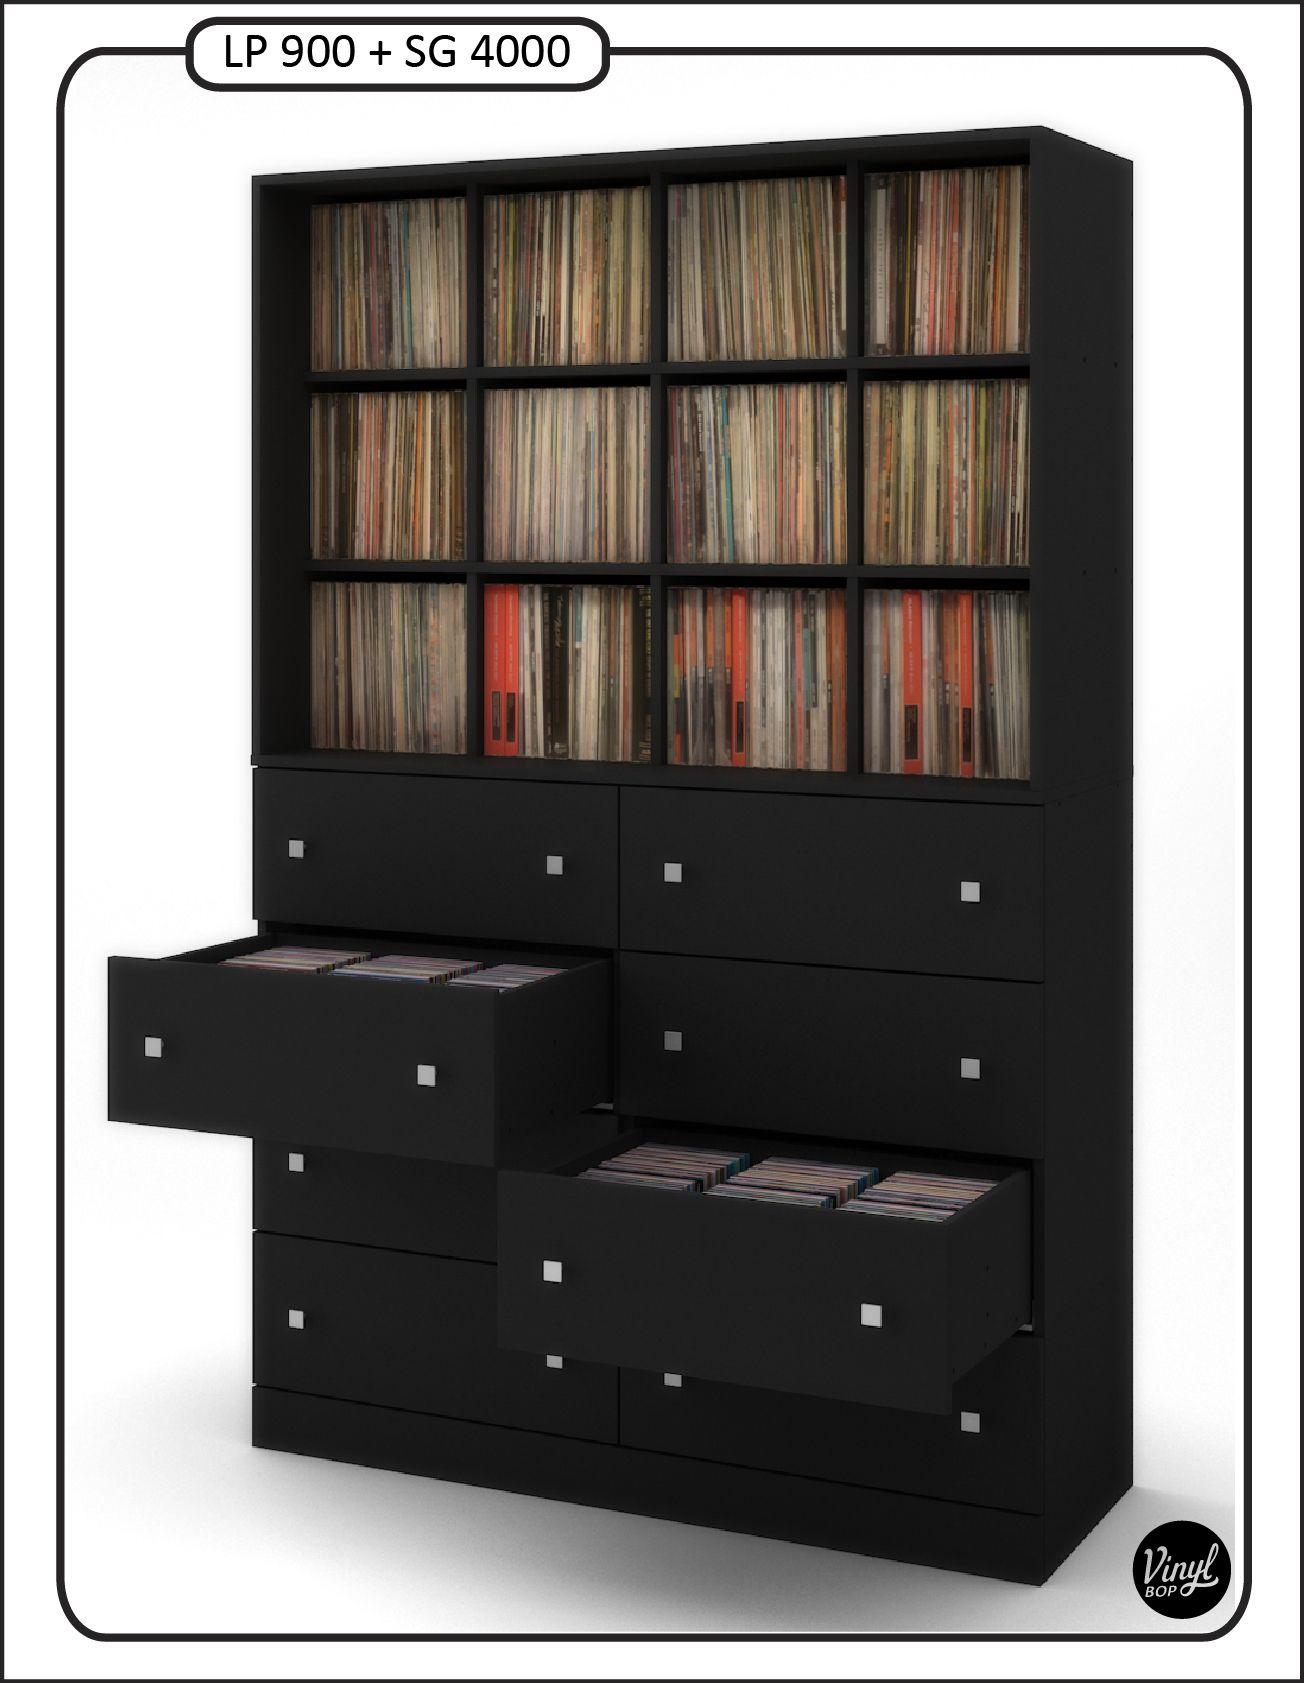 Mixed Size Record Storage By Vinyl Bop Mueble Para 900